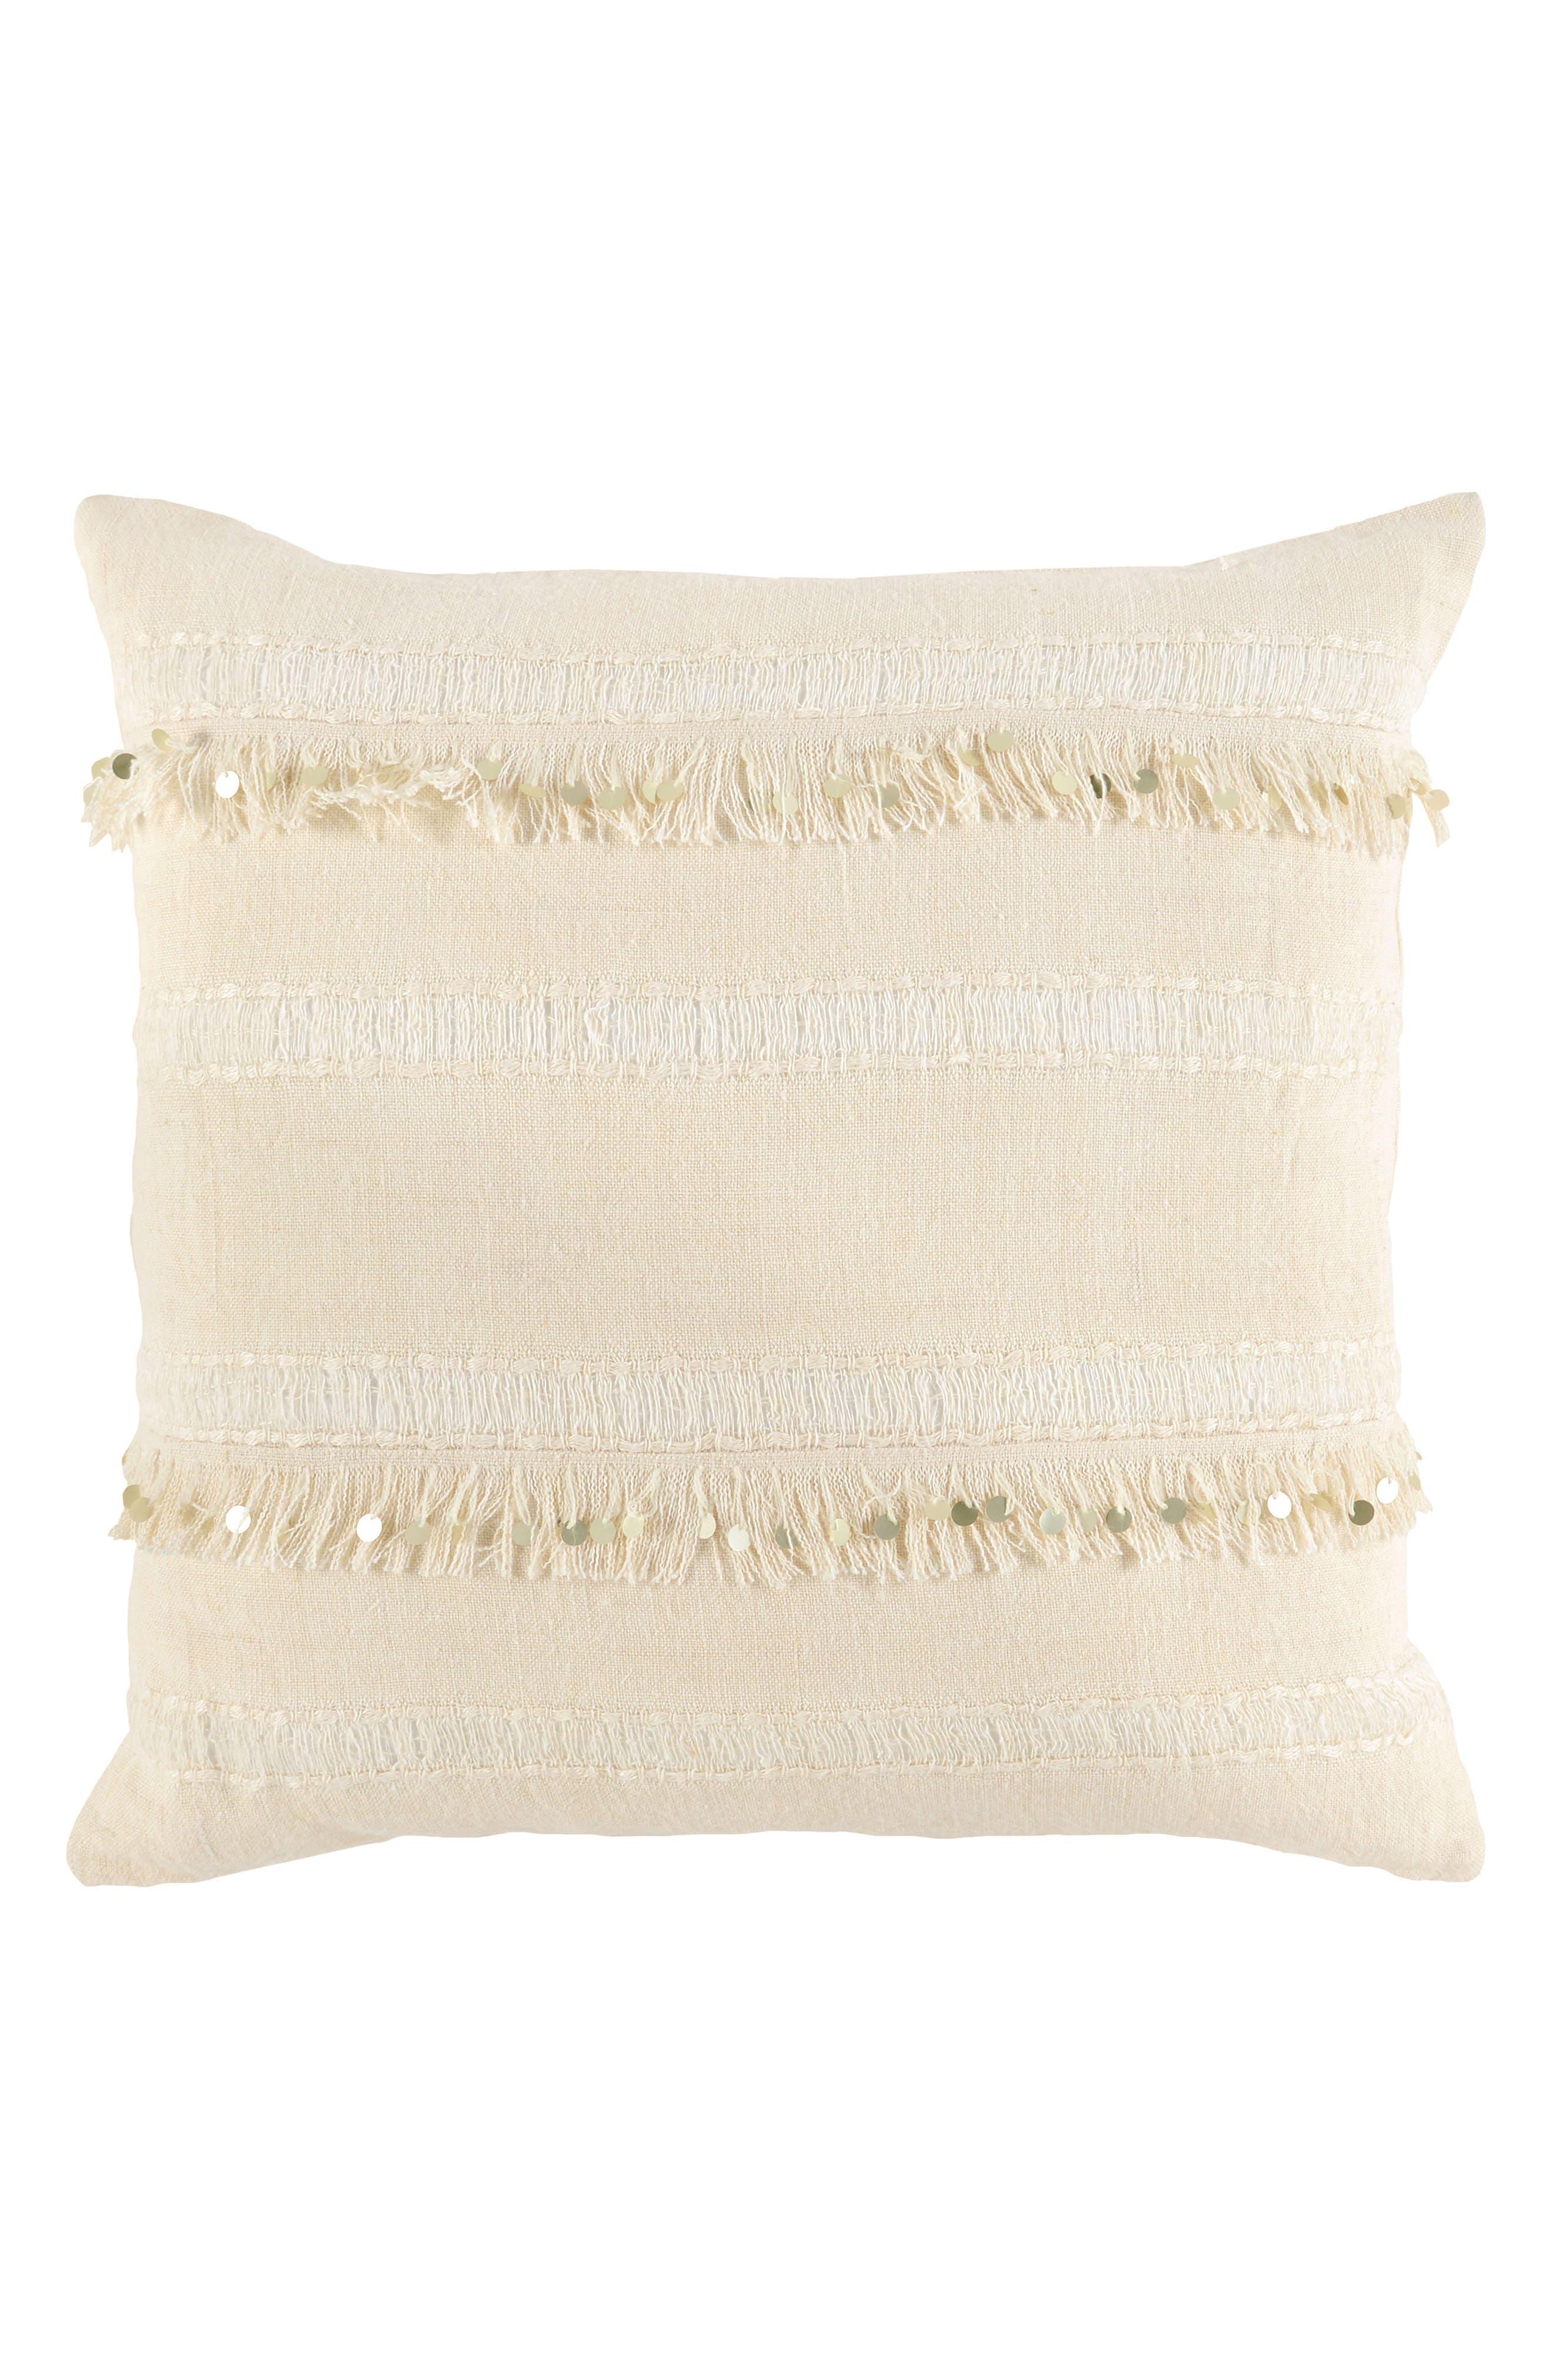 Main Image - Villa Home Collection Dirade Accent Pillow